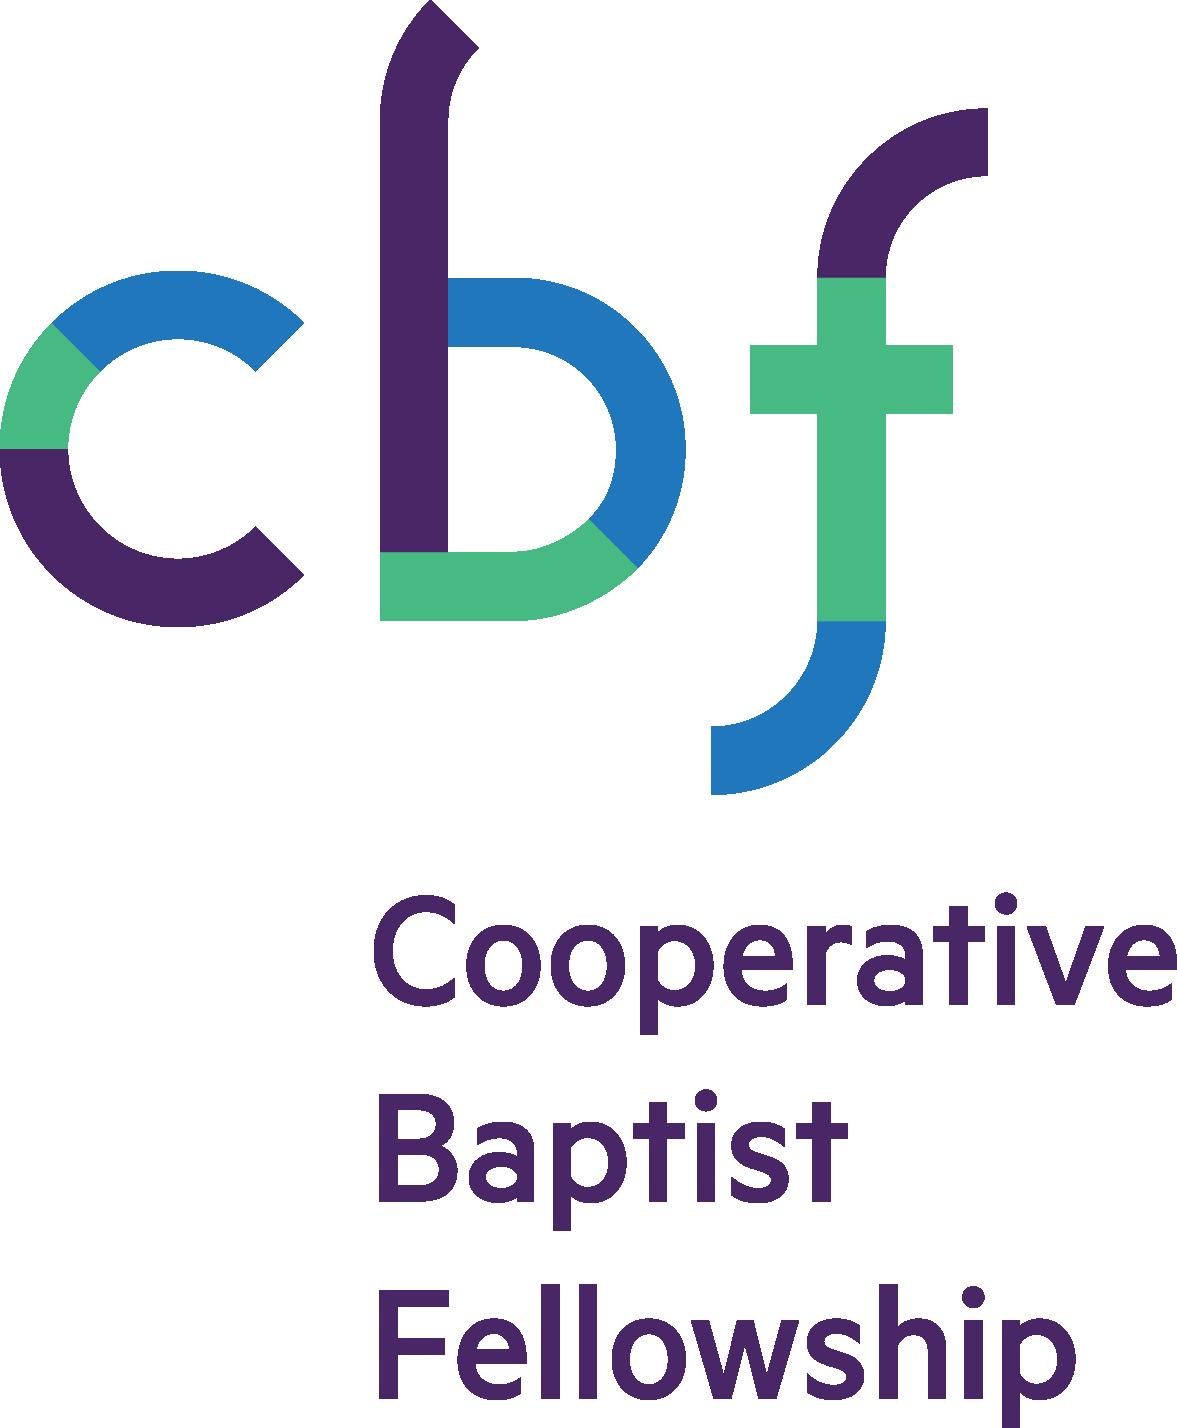 The Cooperative Baptist Fellowship